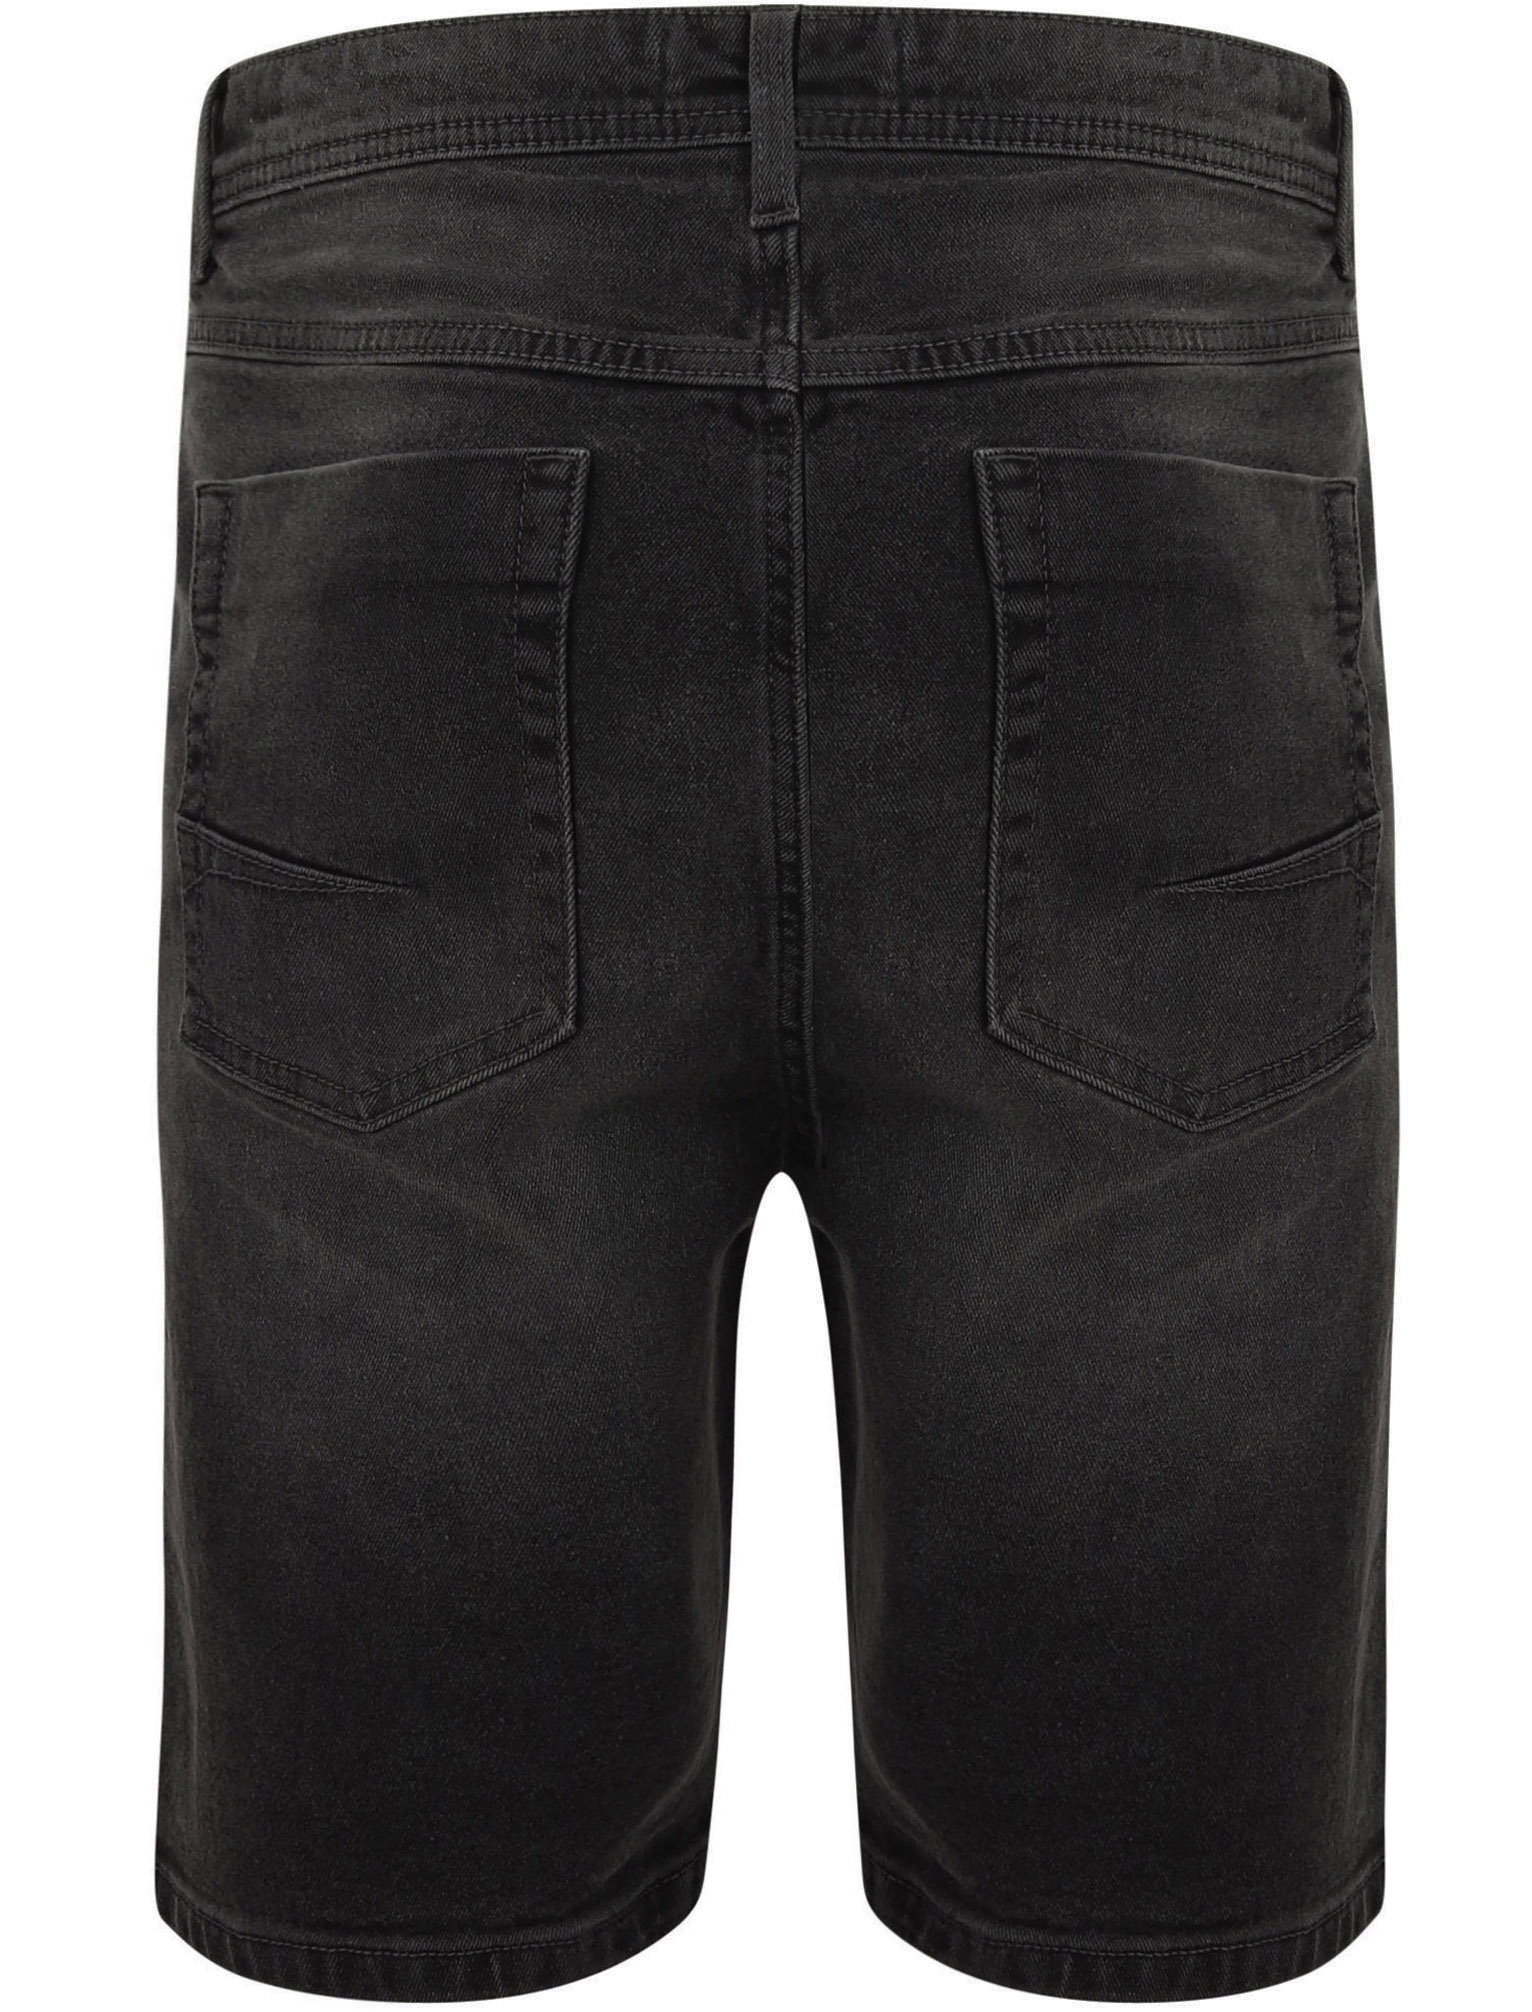 Tokyo-Laundry-Mens-Stretch-Denim-Shorts-Chino-Jean-Vintage-Dark-Light-Wash-Slim thumbnail 7